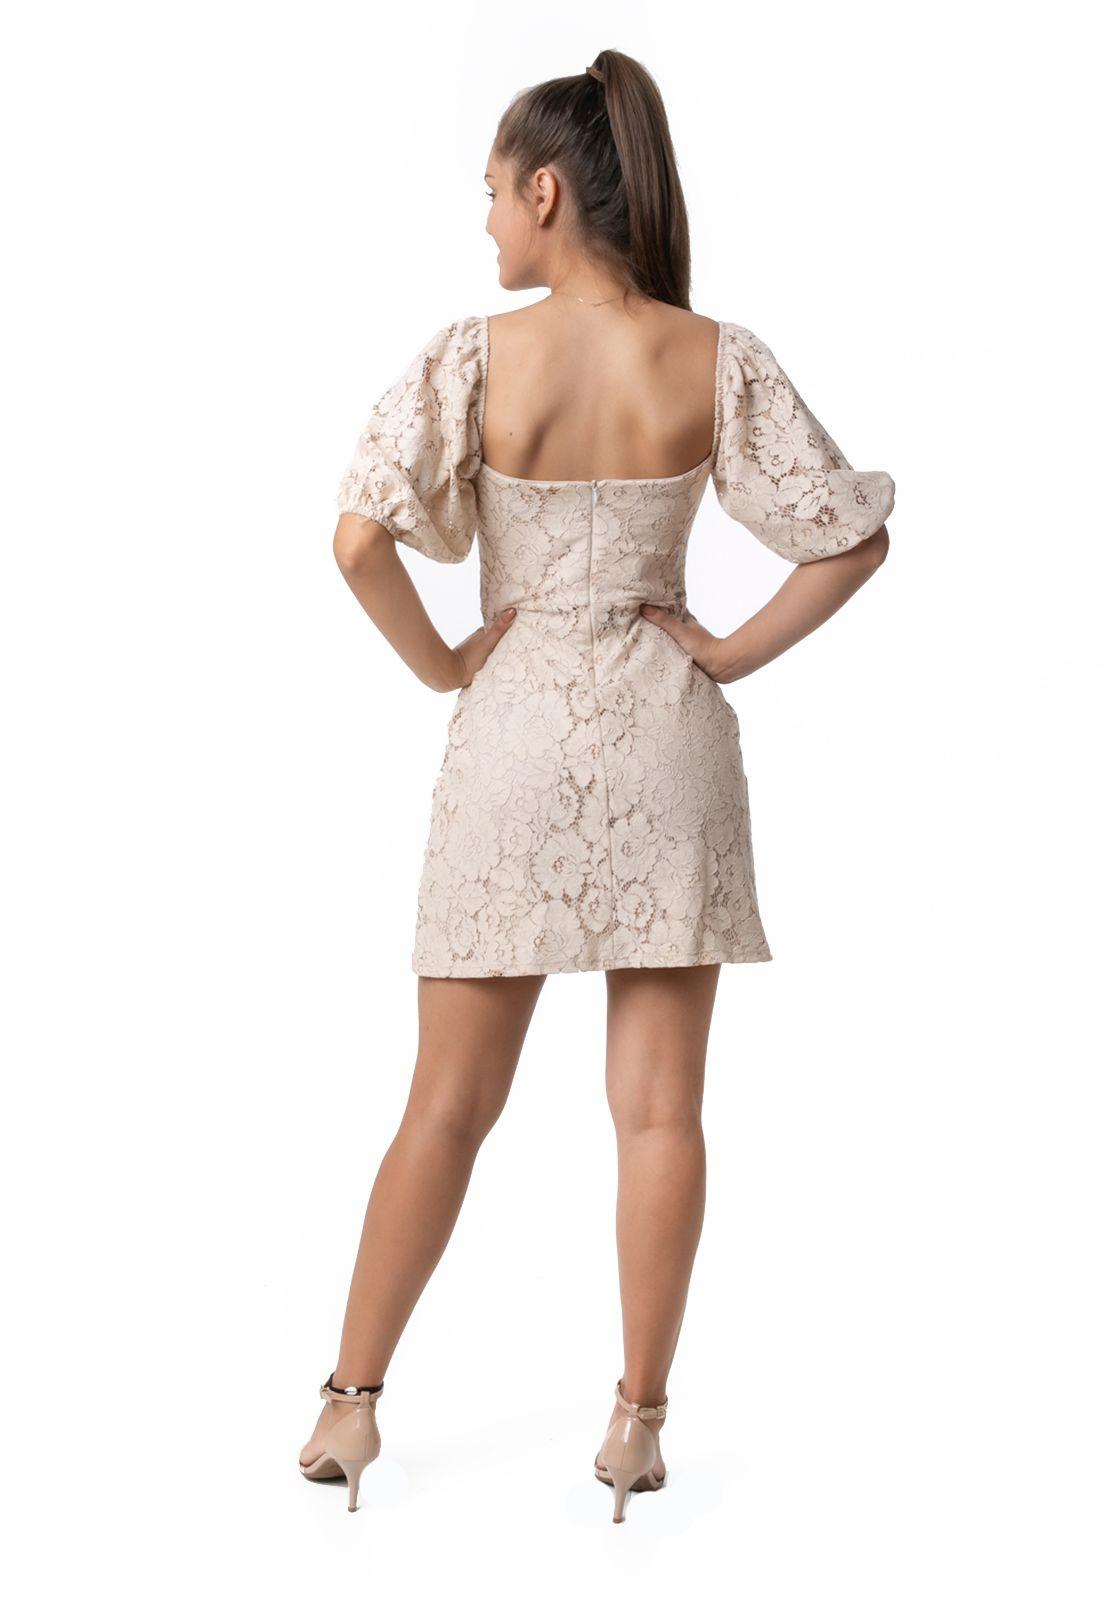 Vestido Pkd Mangas Bufantes de Renda Creme